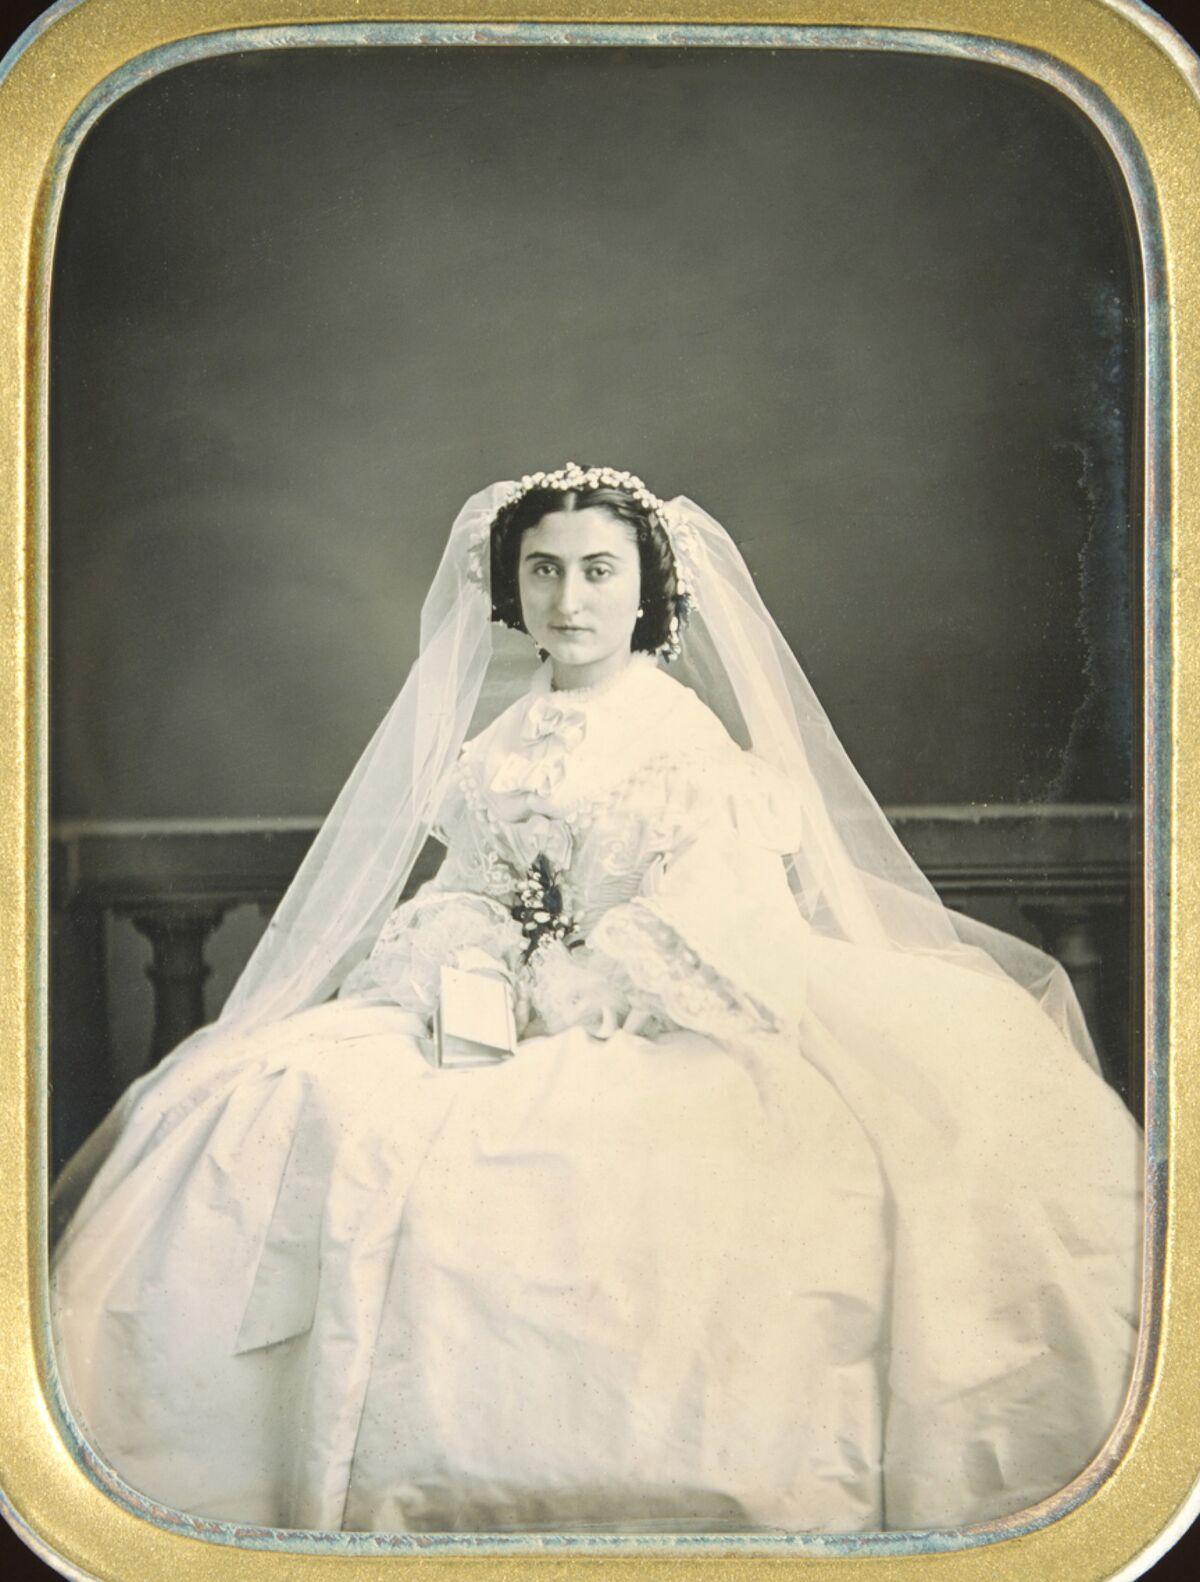 Désiré-François Millet. Untitled (Bride), n.d. Courtesy of The Barnes Foundation, Michael Mattis and Judy Hochberg.